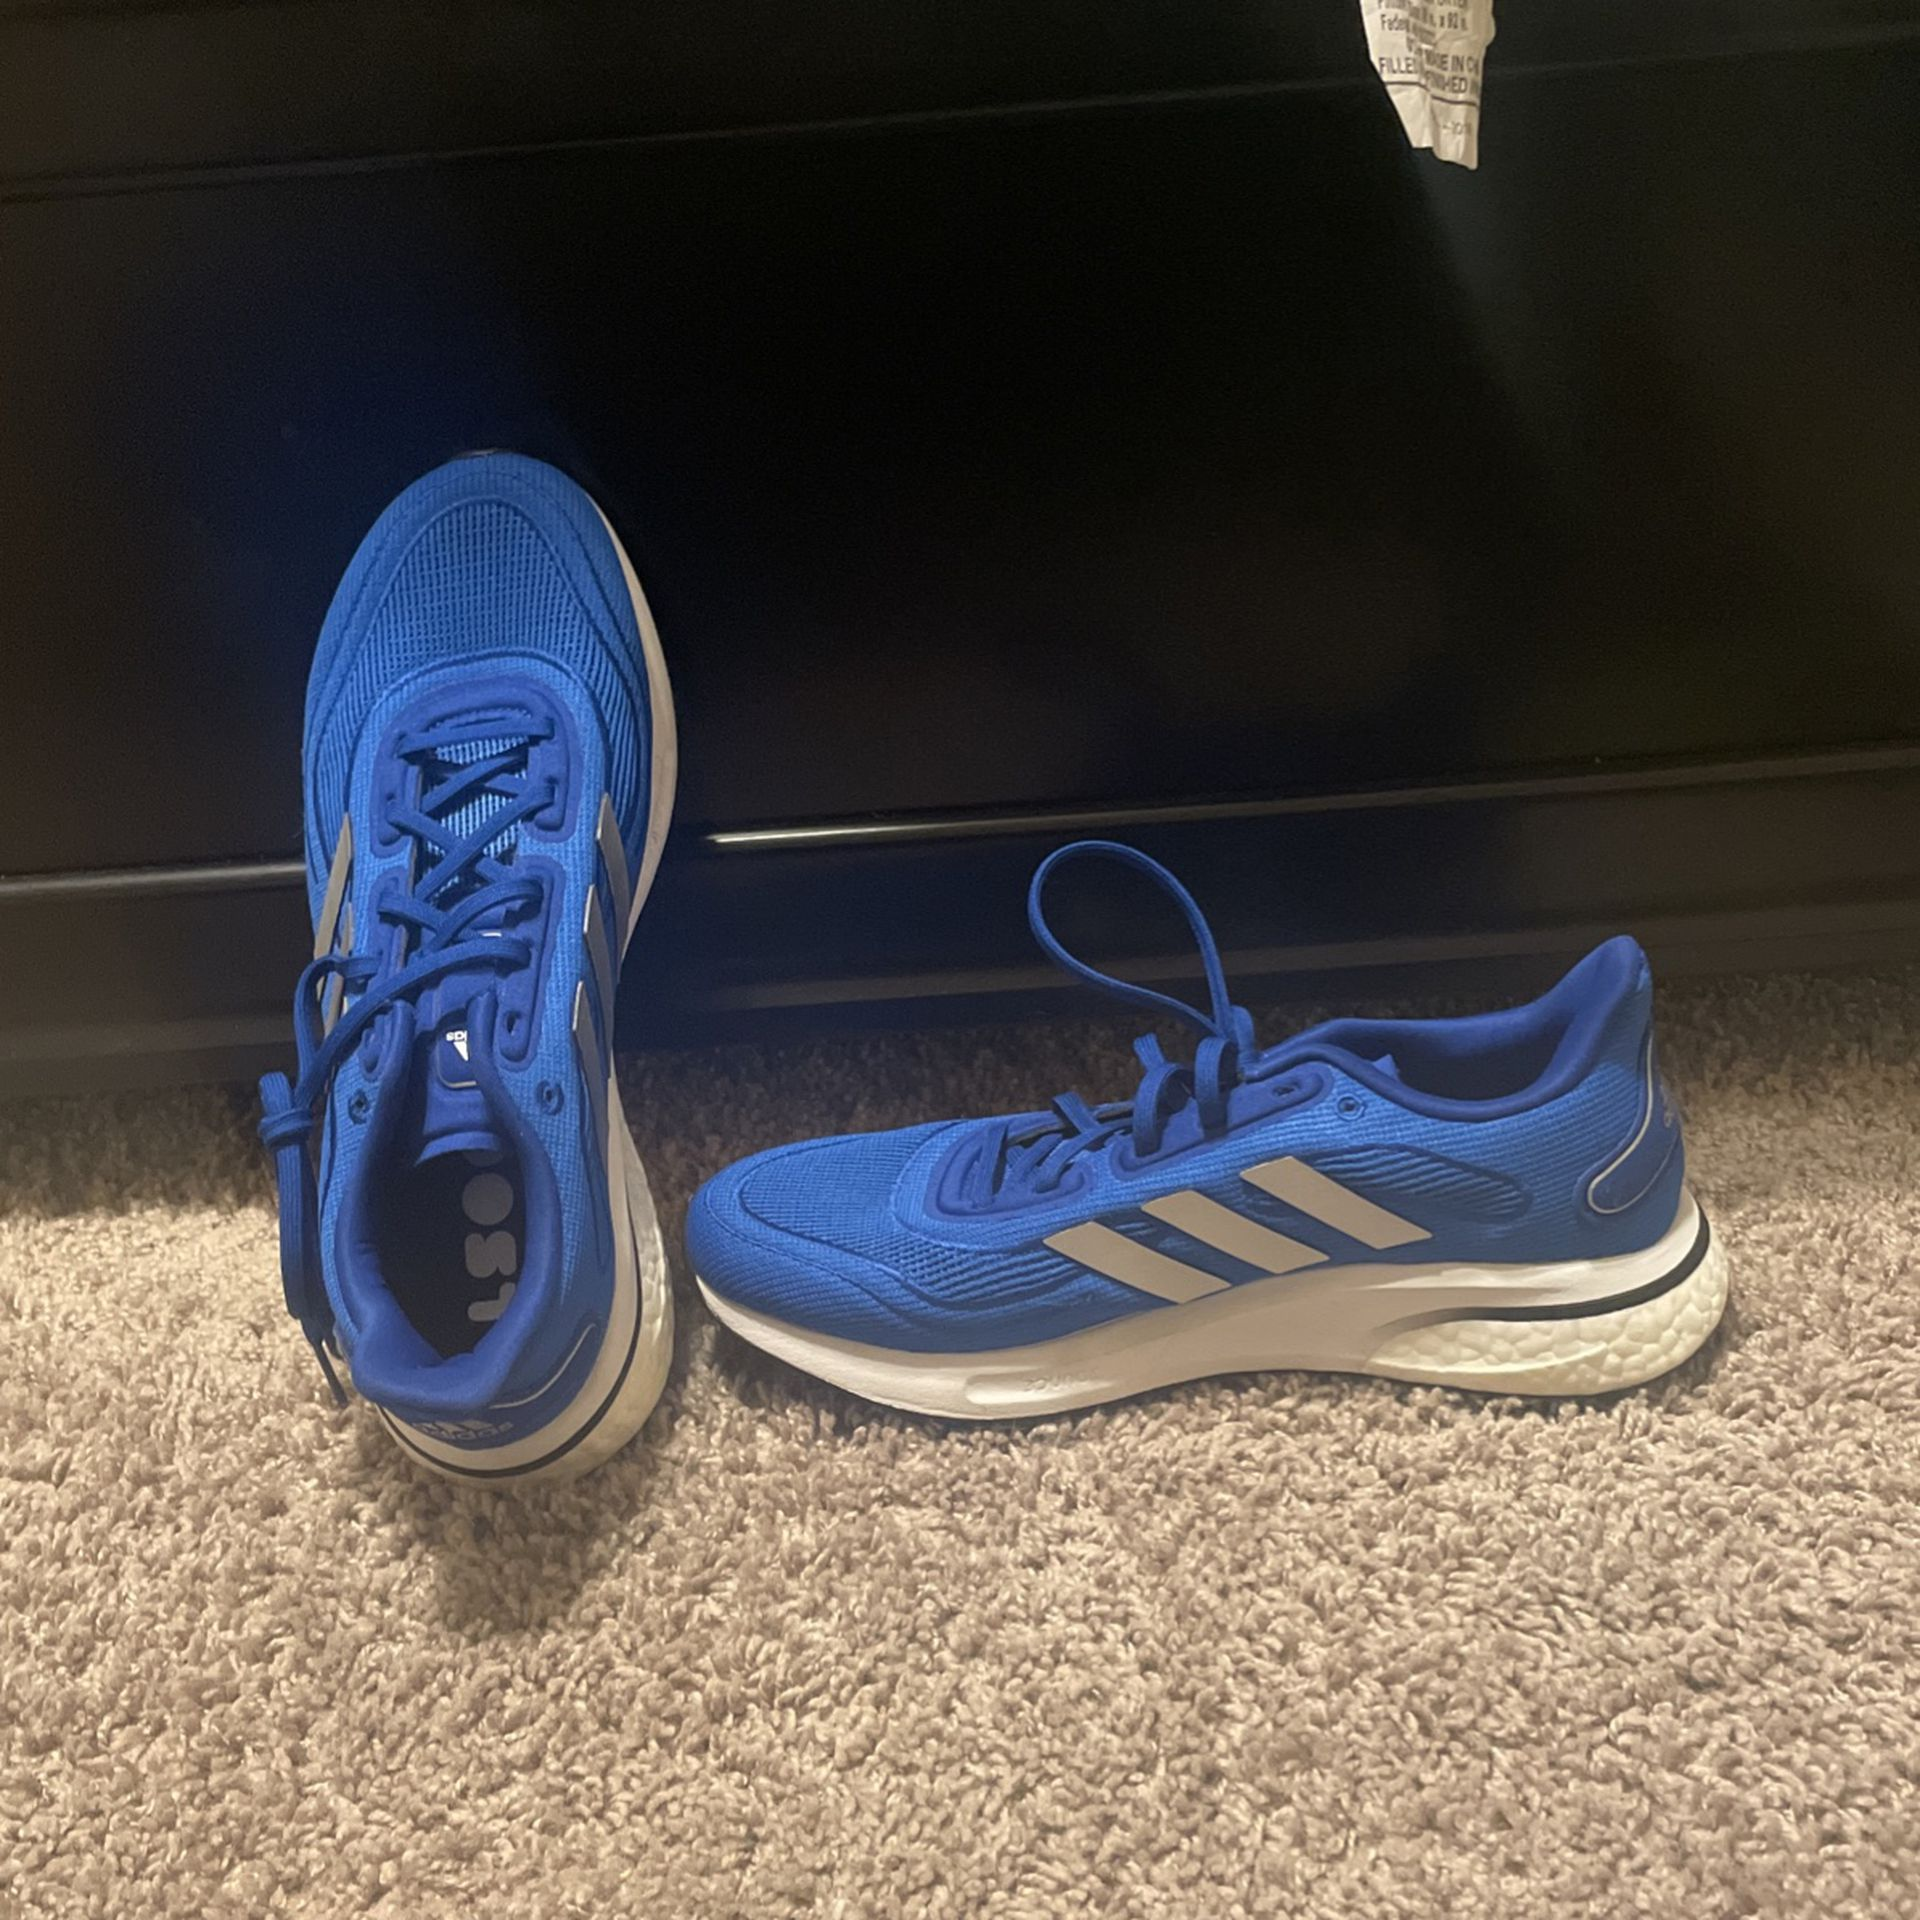 Adidas, Running shoes, 8 Unisex